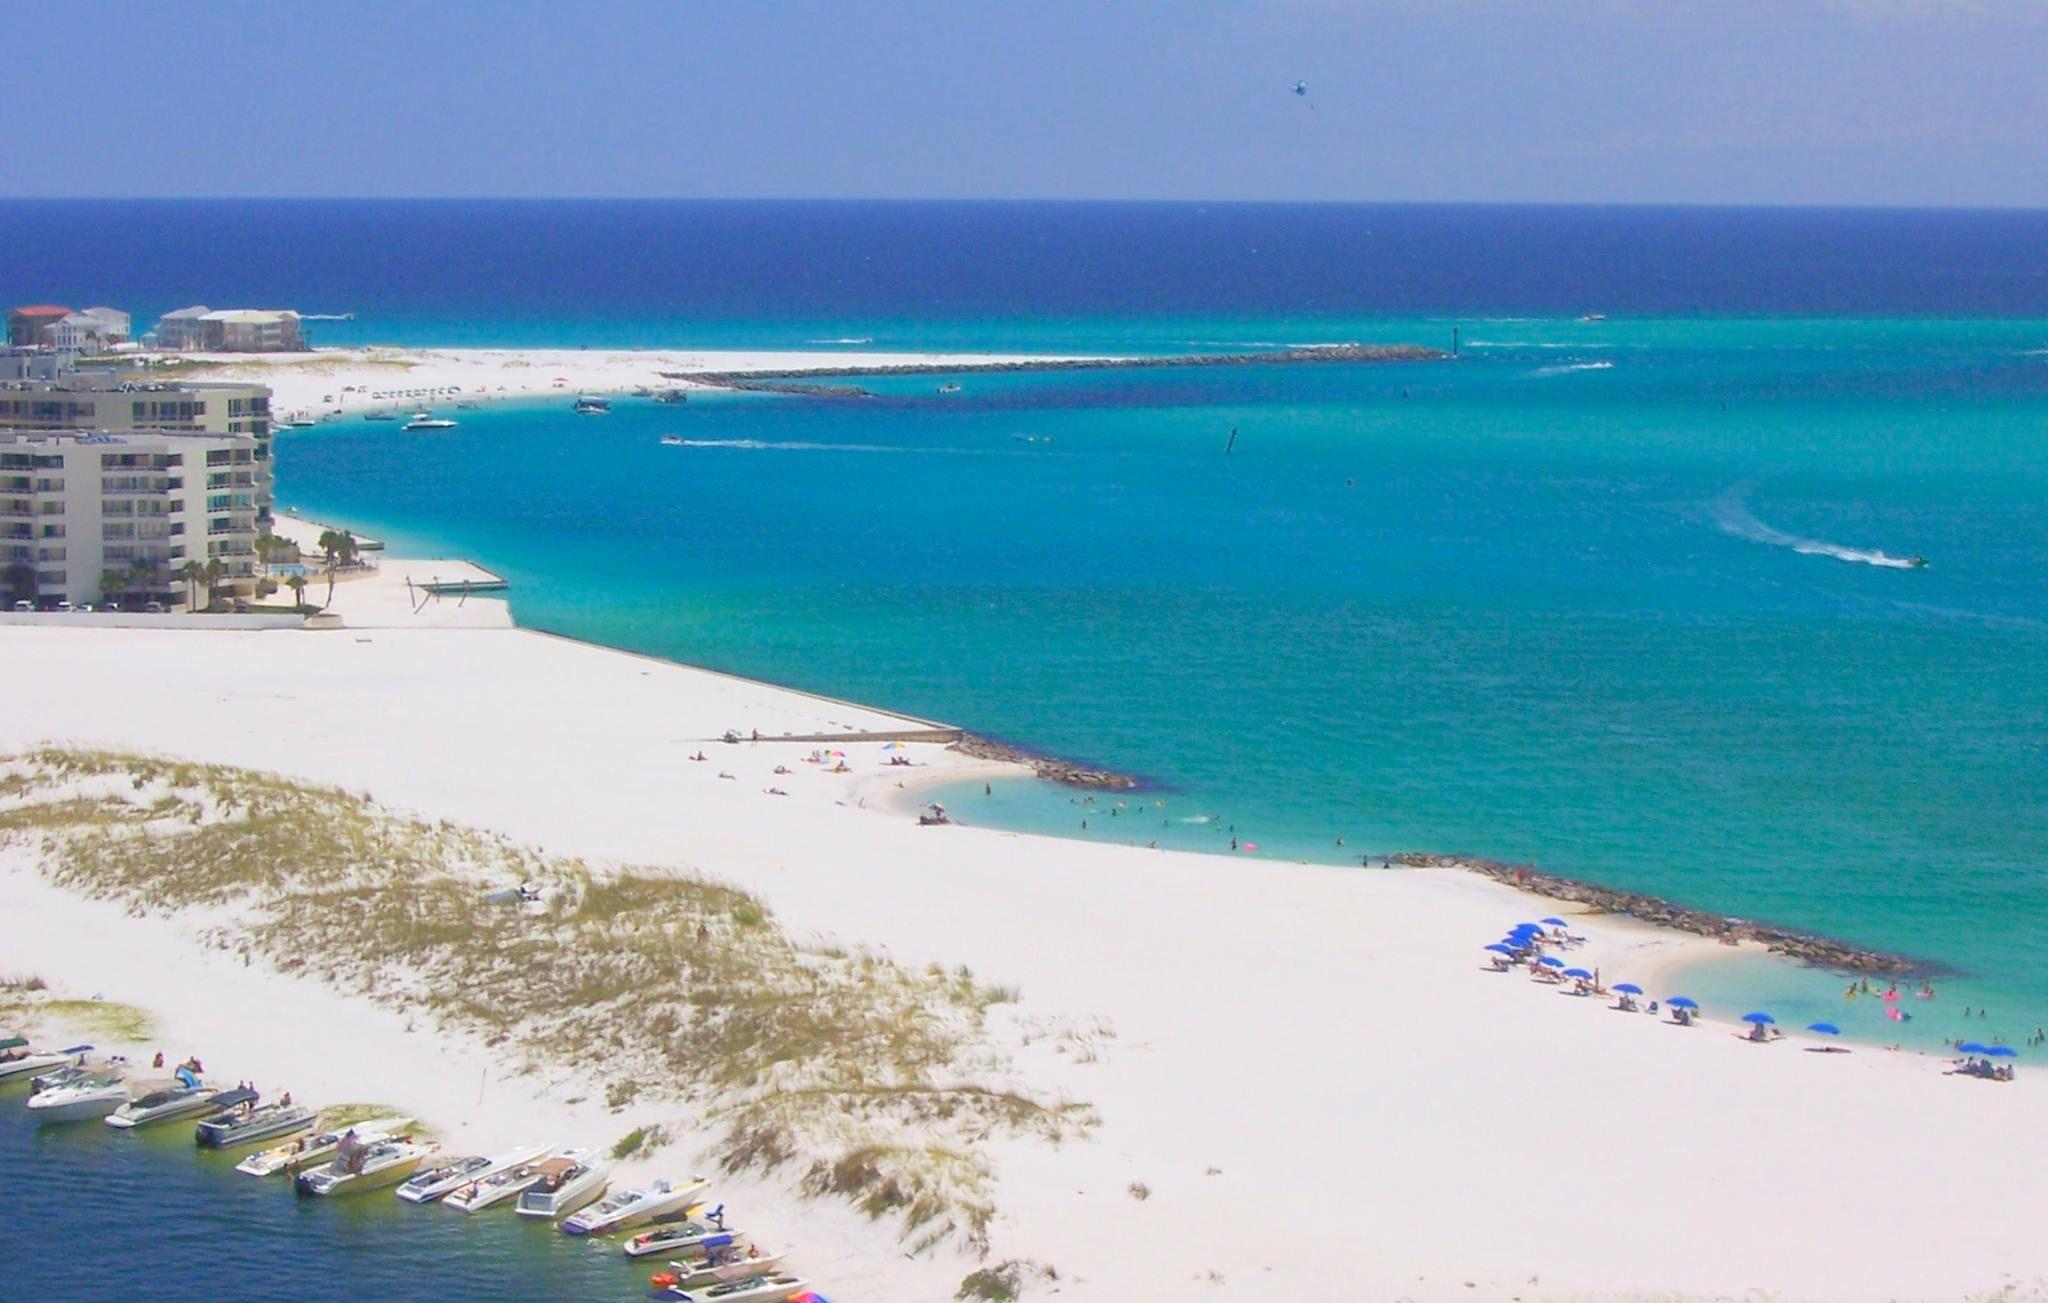 This Is Destin Florida Picture Your Ceremony On That Sugar White Sand Www Surfsidebrides Com Beach Destin Destin Florida